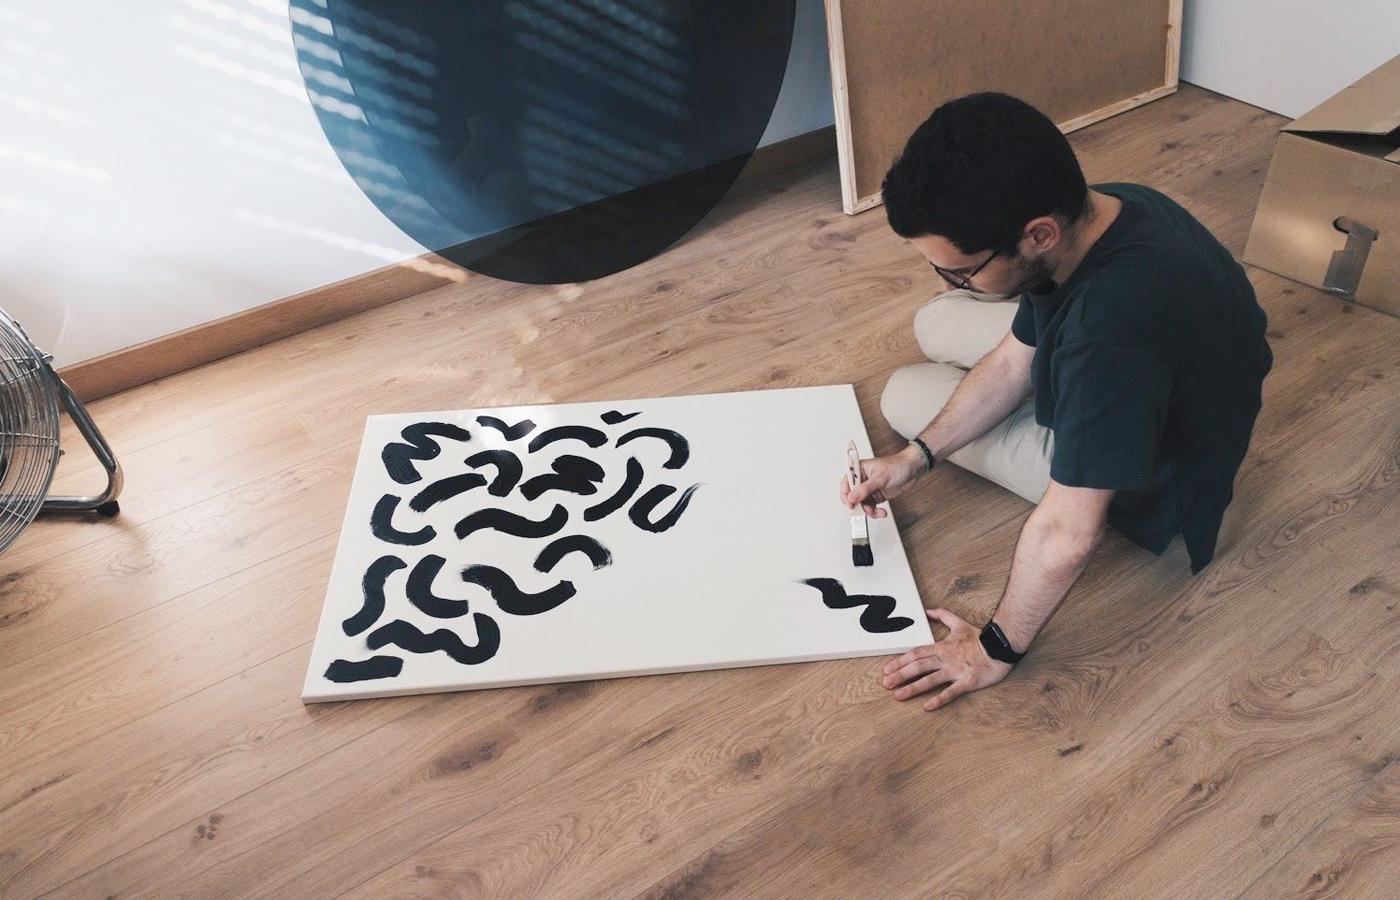 Entrevista Nil Castellví - Arte y pintar